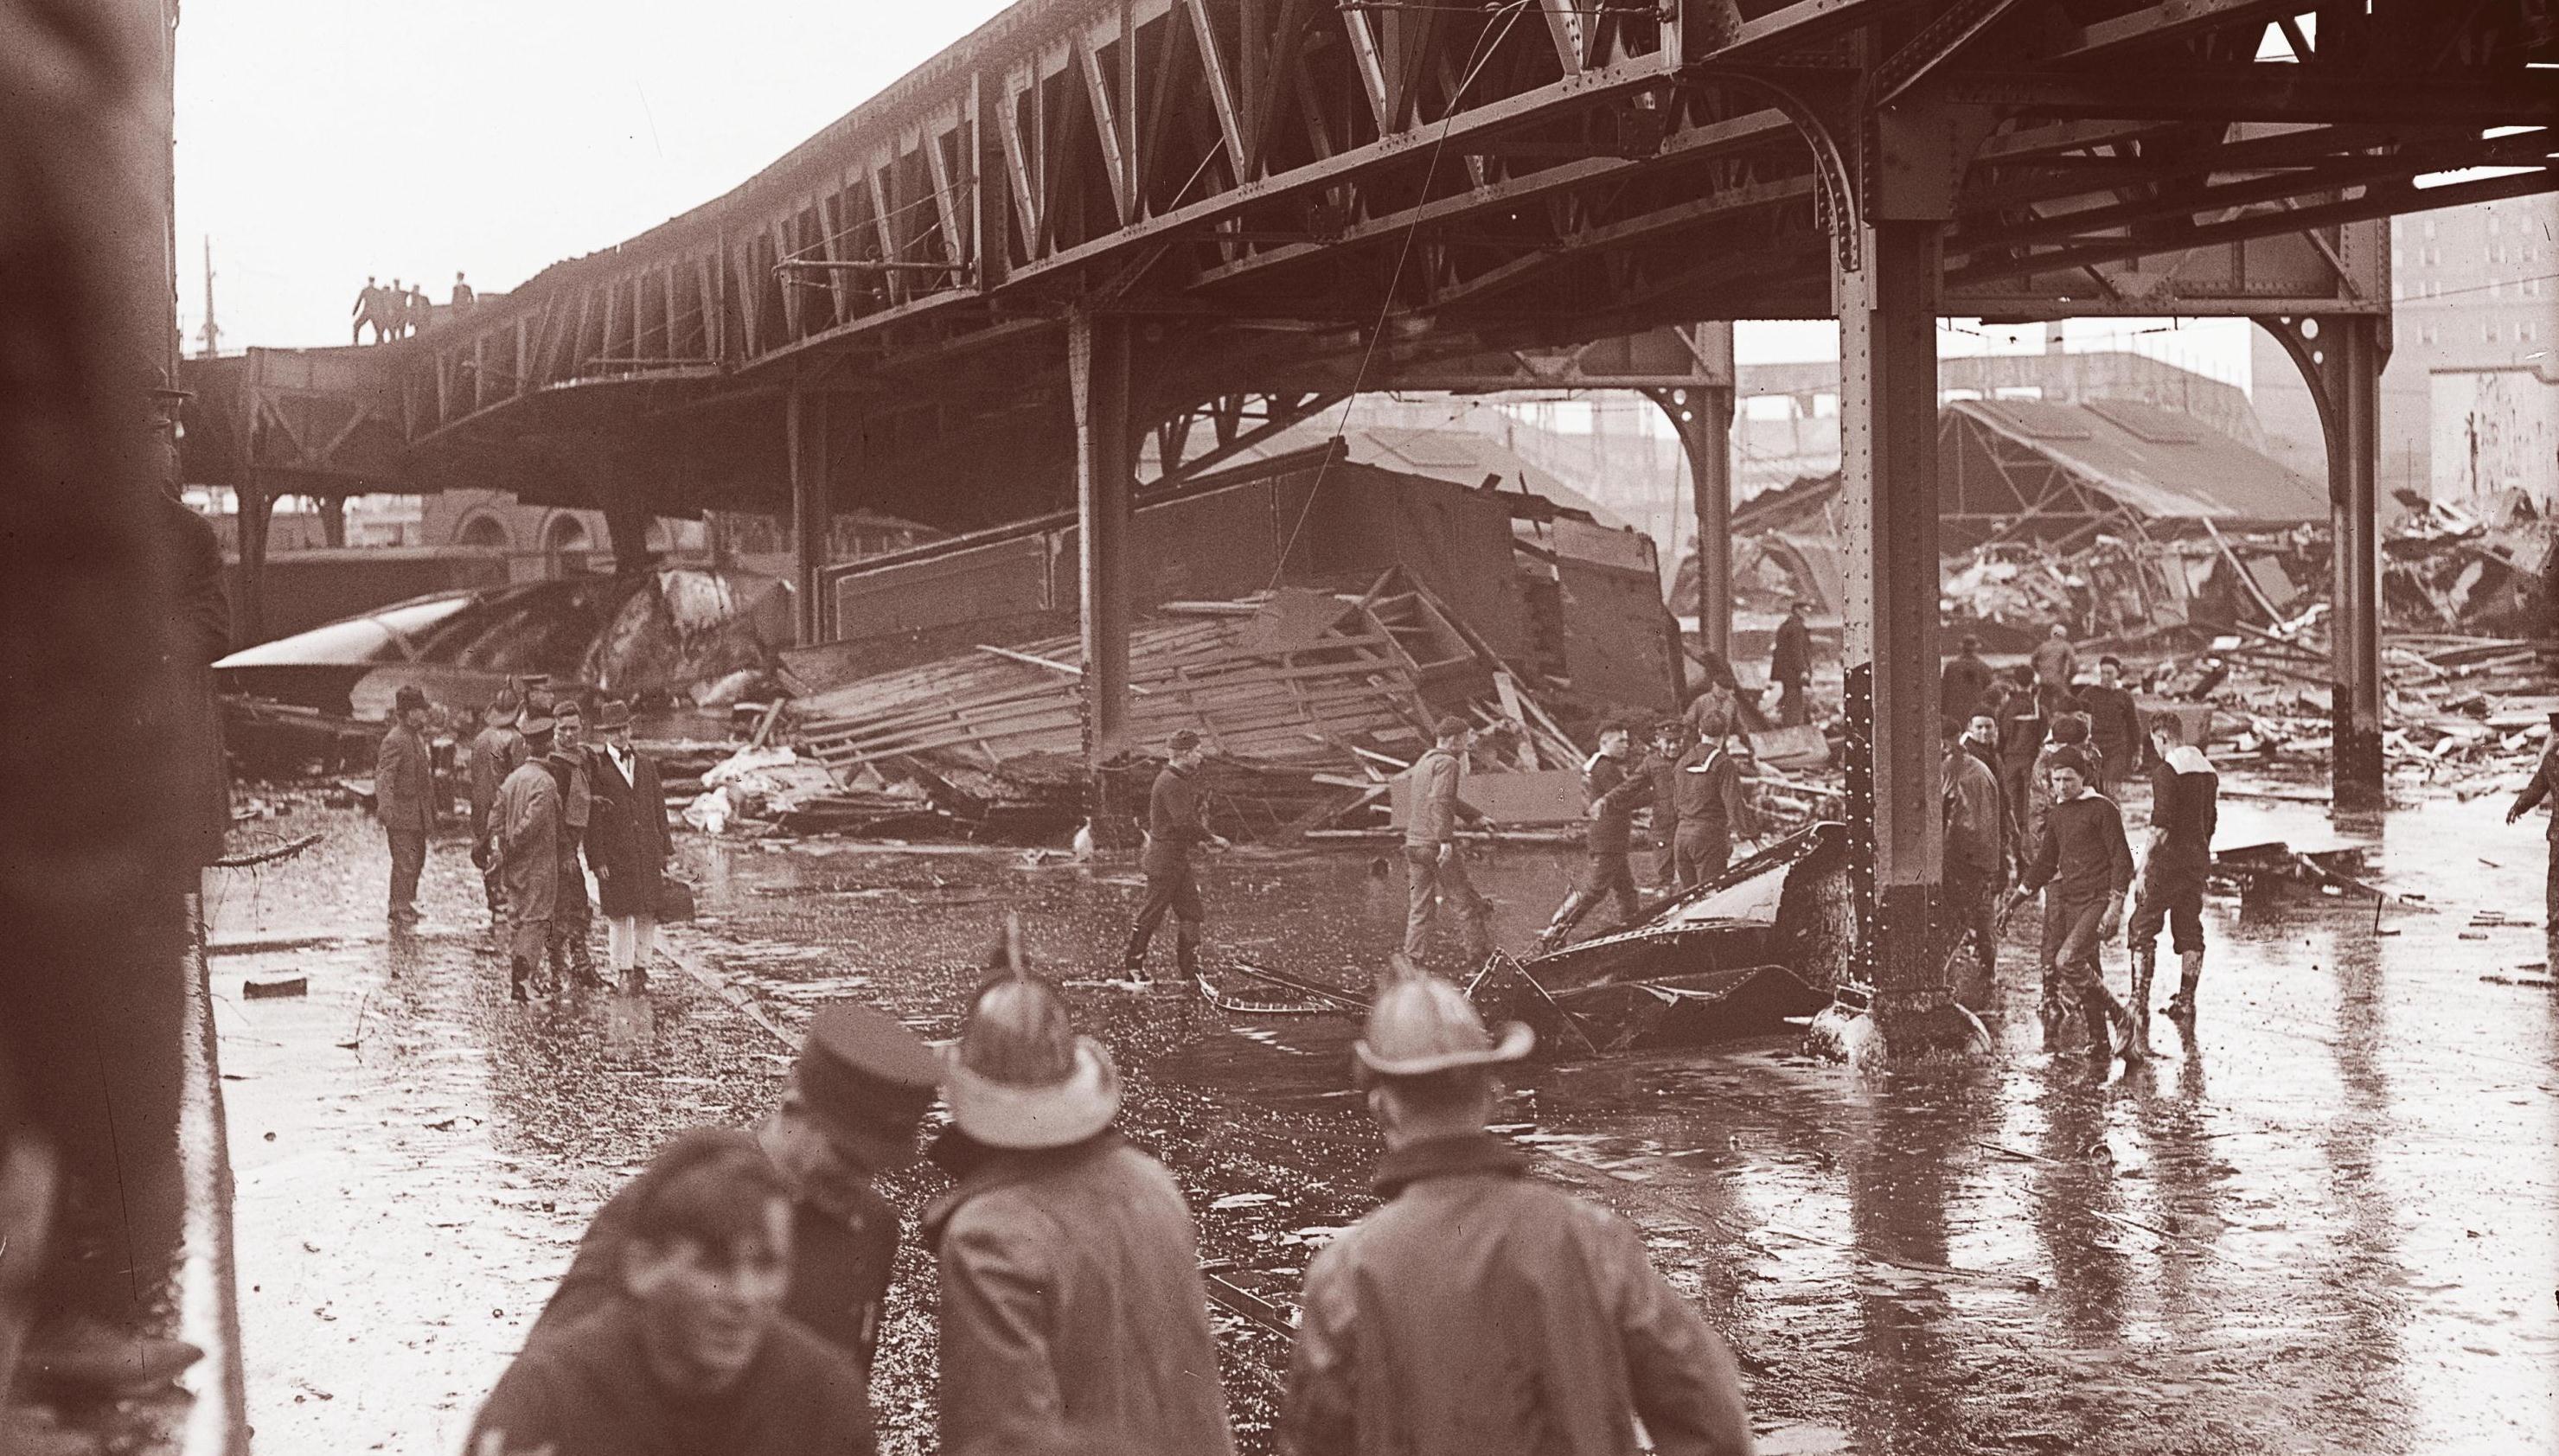 Boston Molasses Flood - what a mess